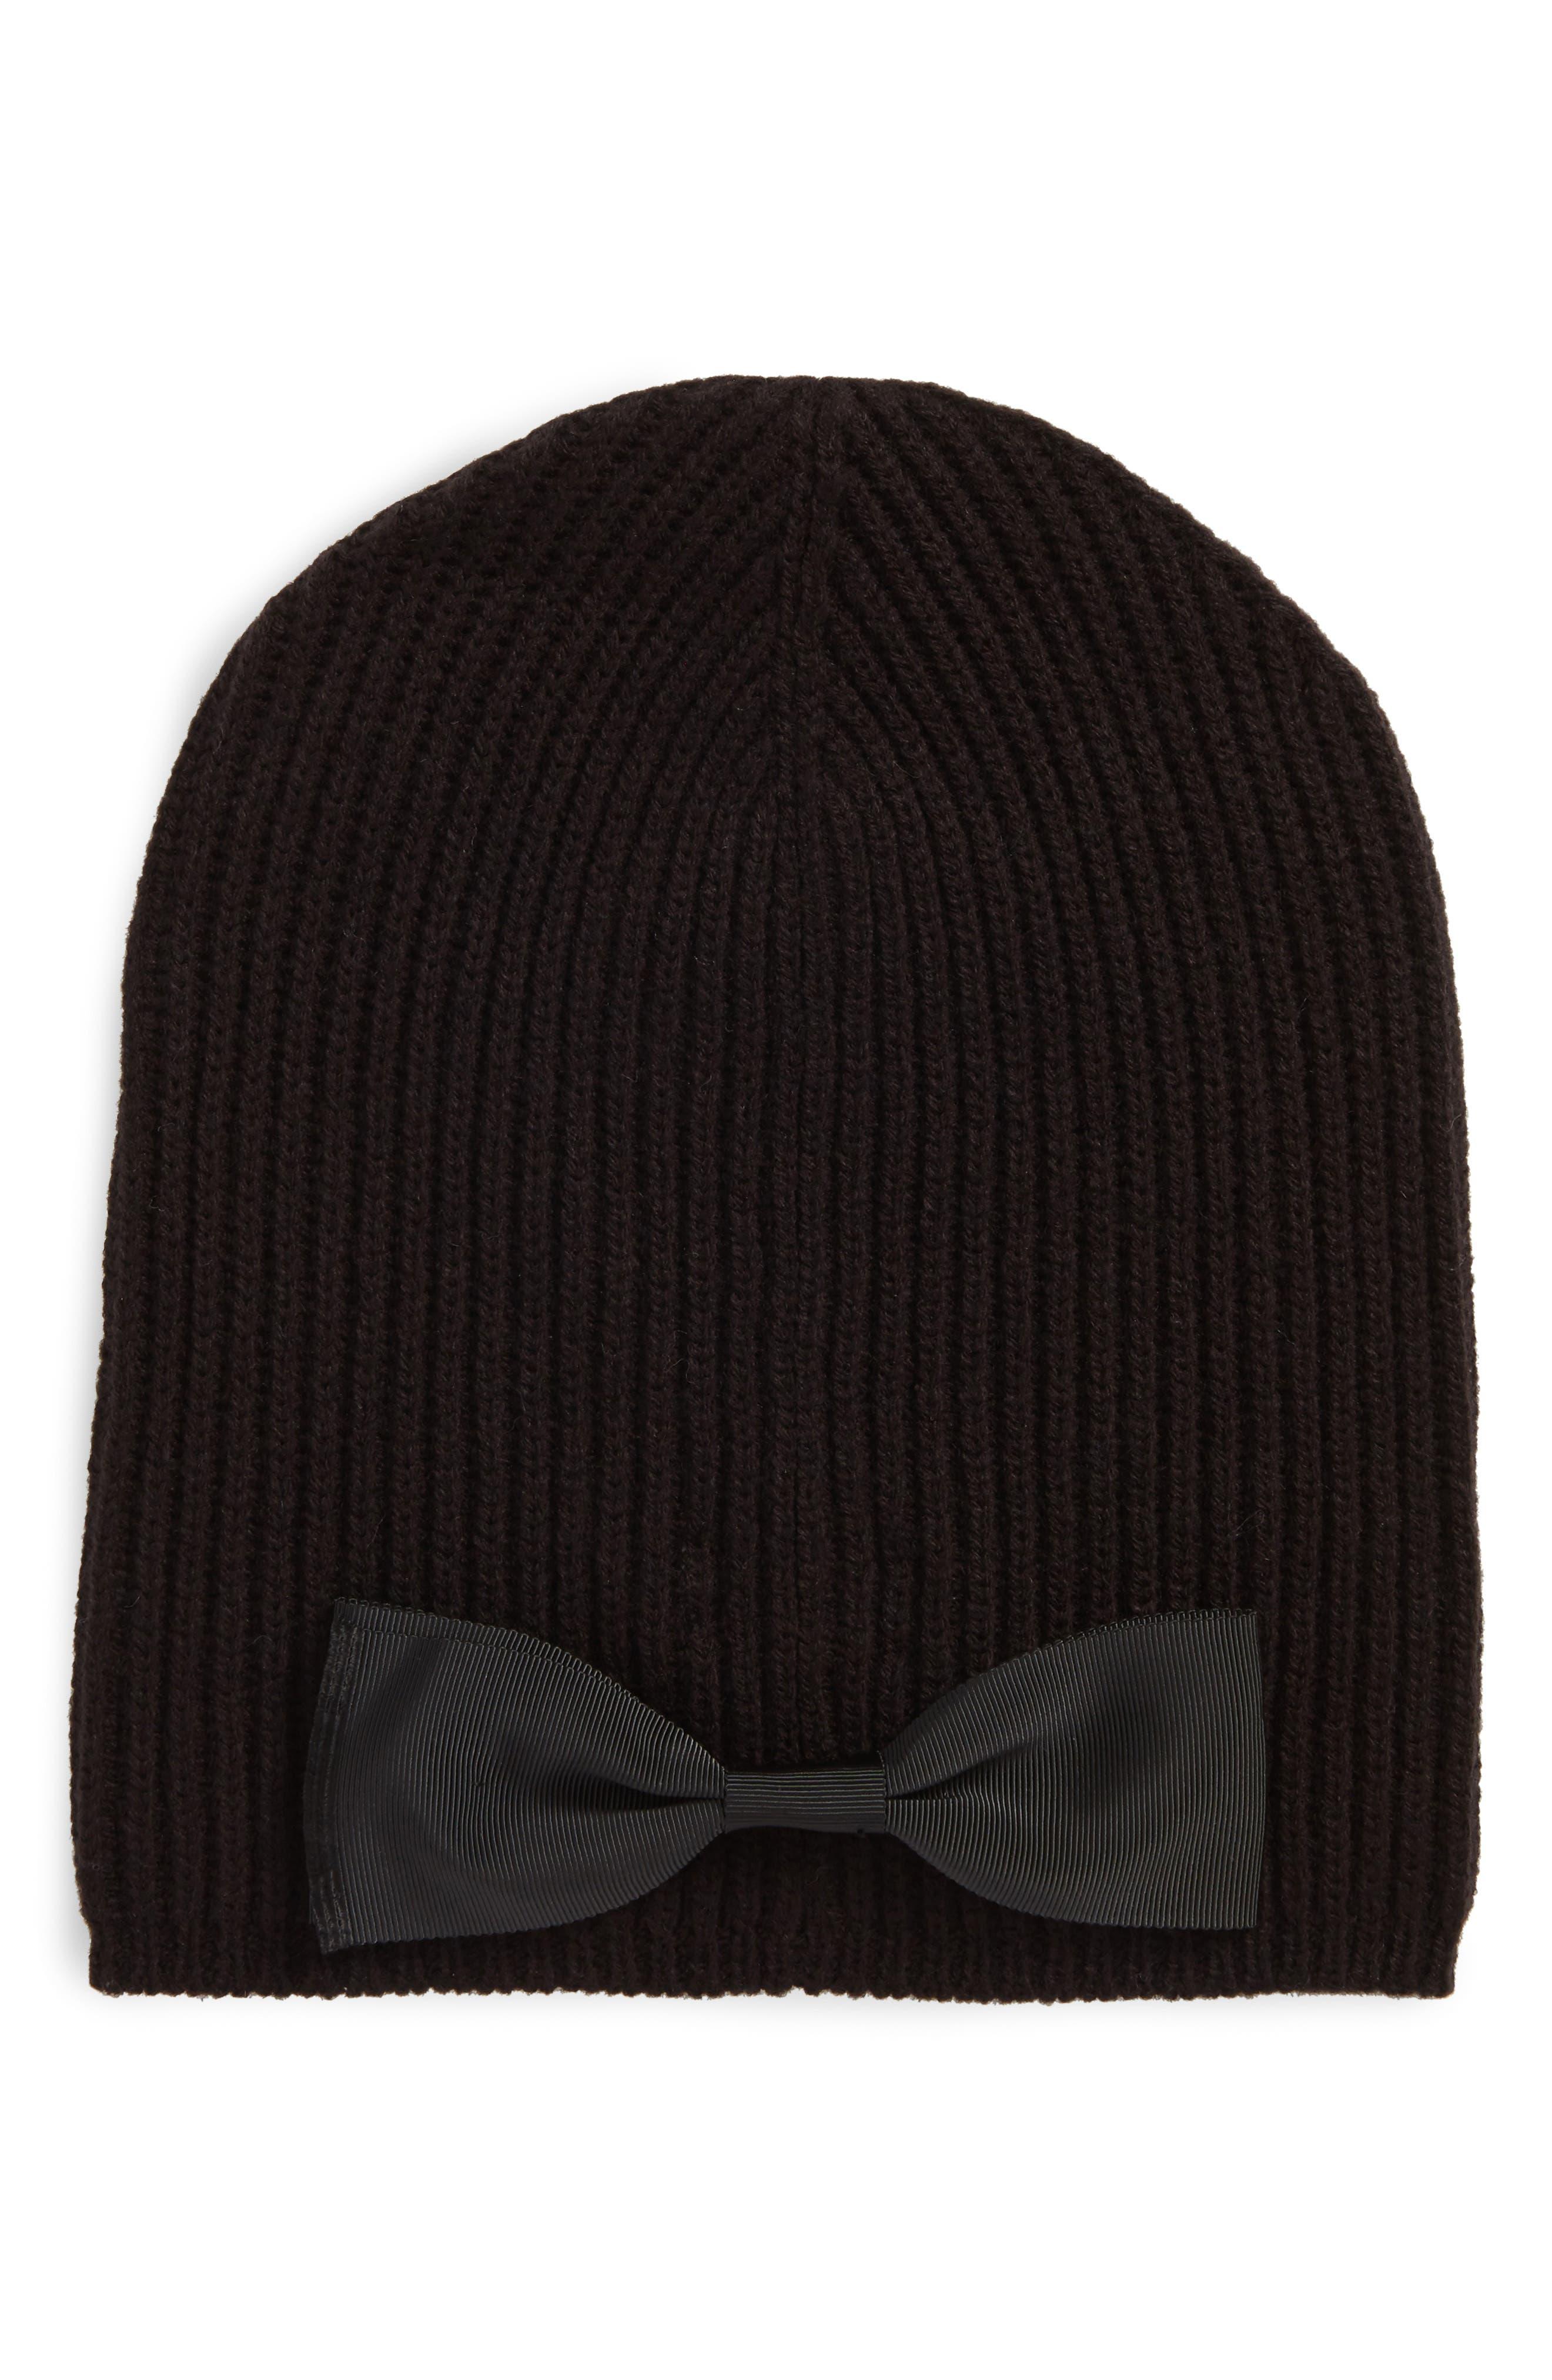 kate spade new york grosgrain bow knit beanie